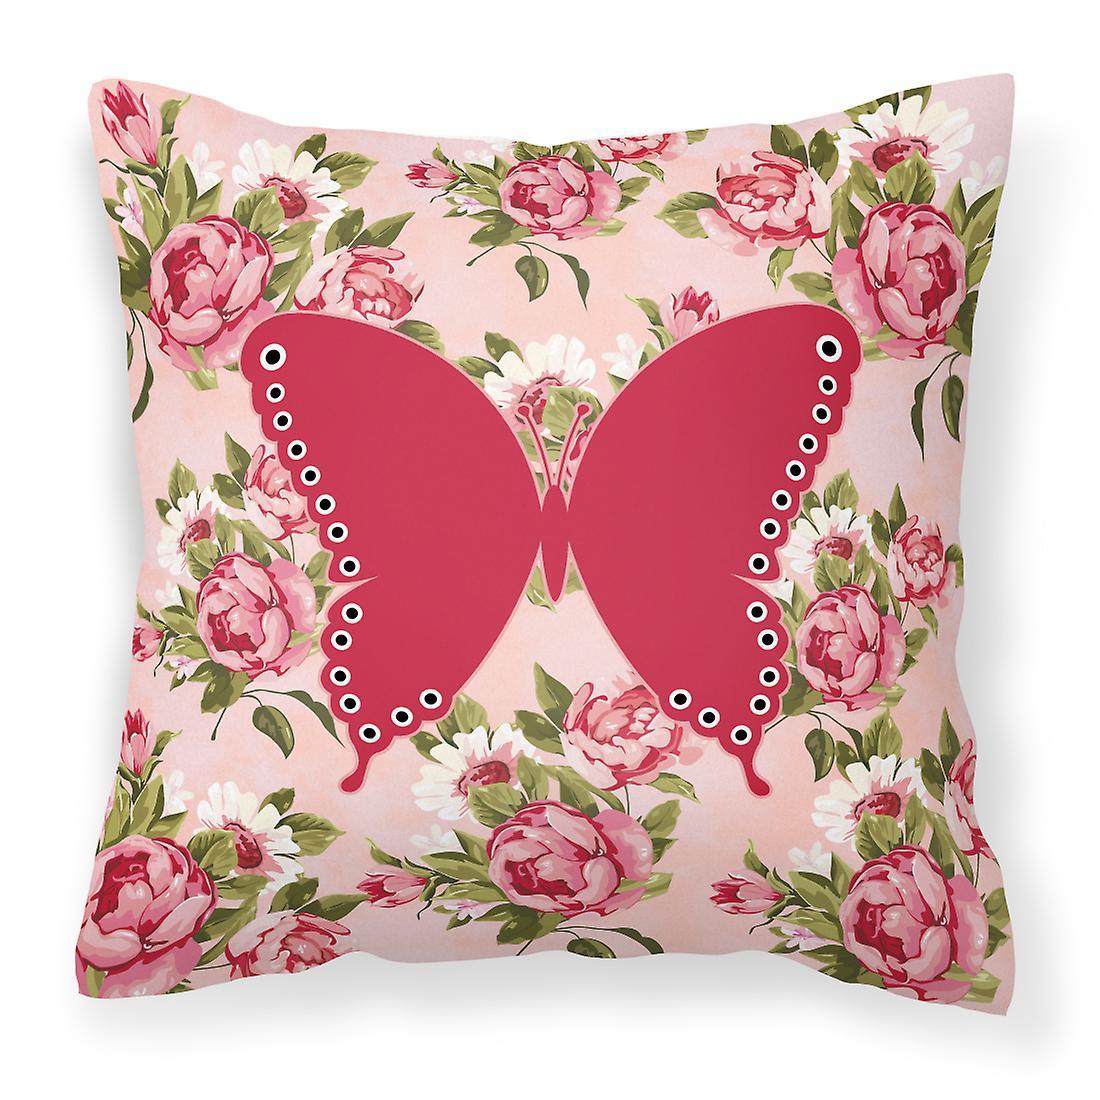 Tissu Oreiller Rose Chic Minable Papillons Roses Décoratif qSVpUMGz